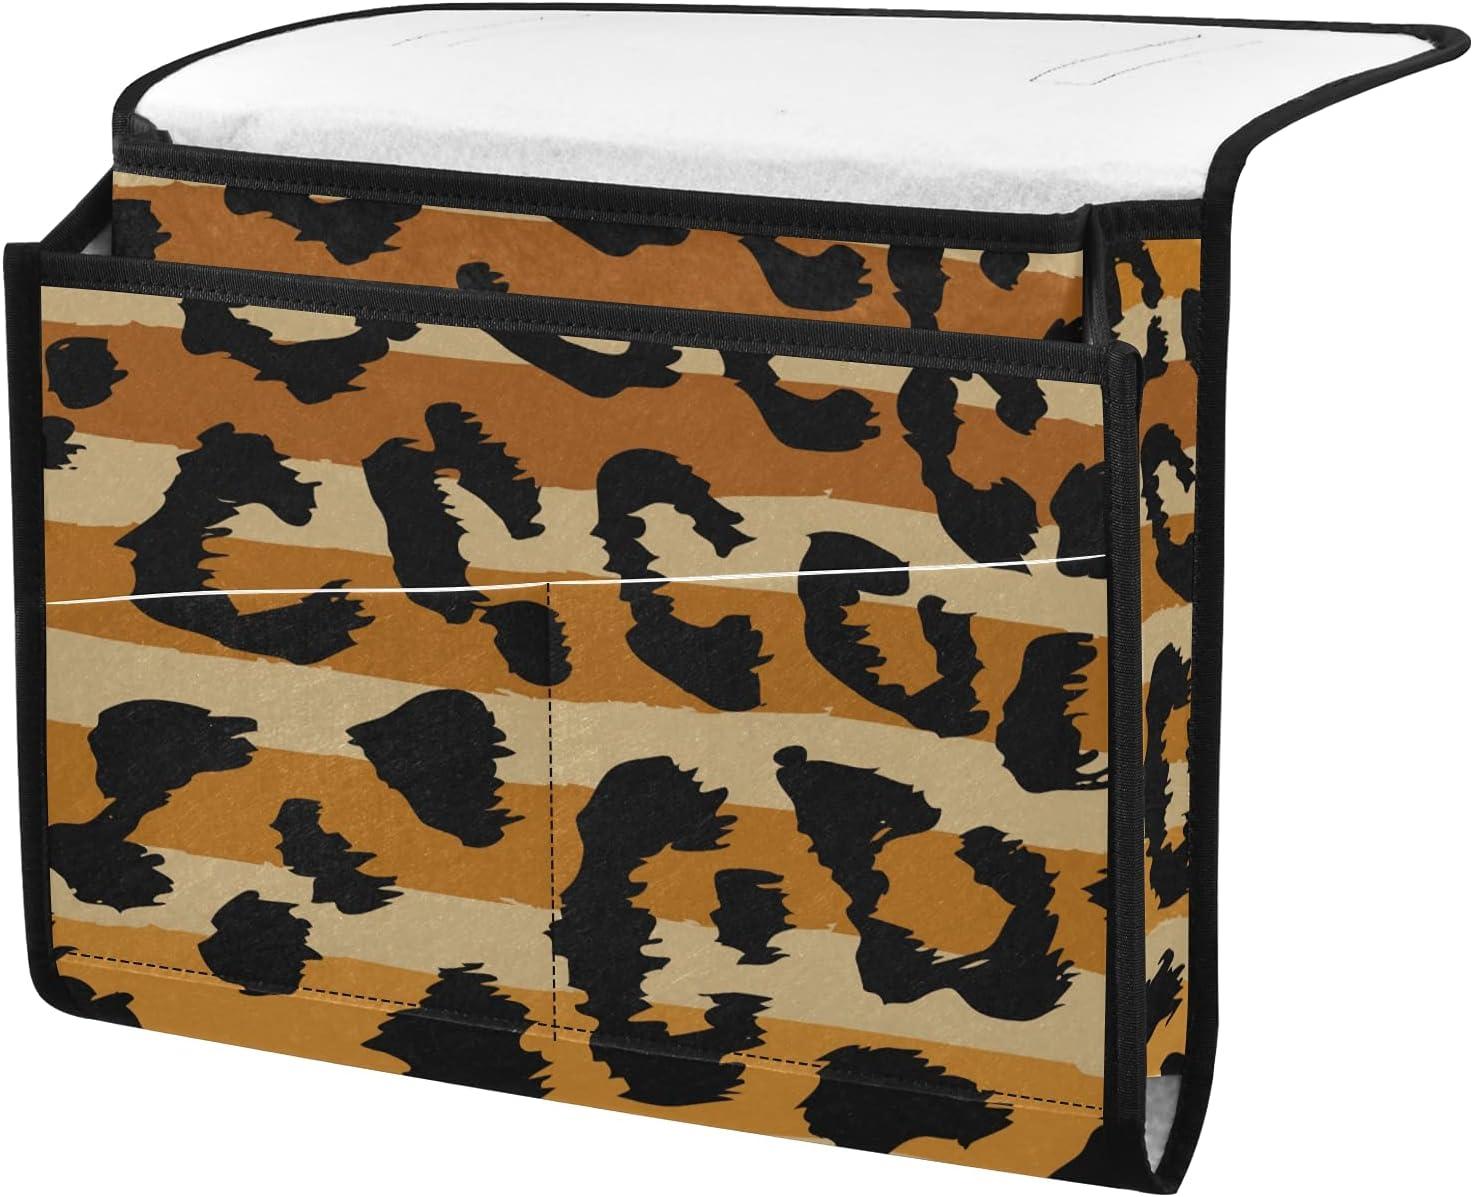 All items free shipping senya Leopard Stripes Pattern Design B Organizer New Shipping Free Shipping Storage Bedside